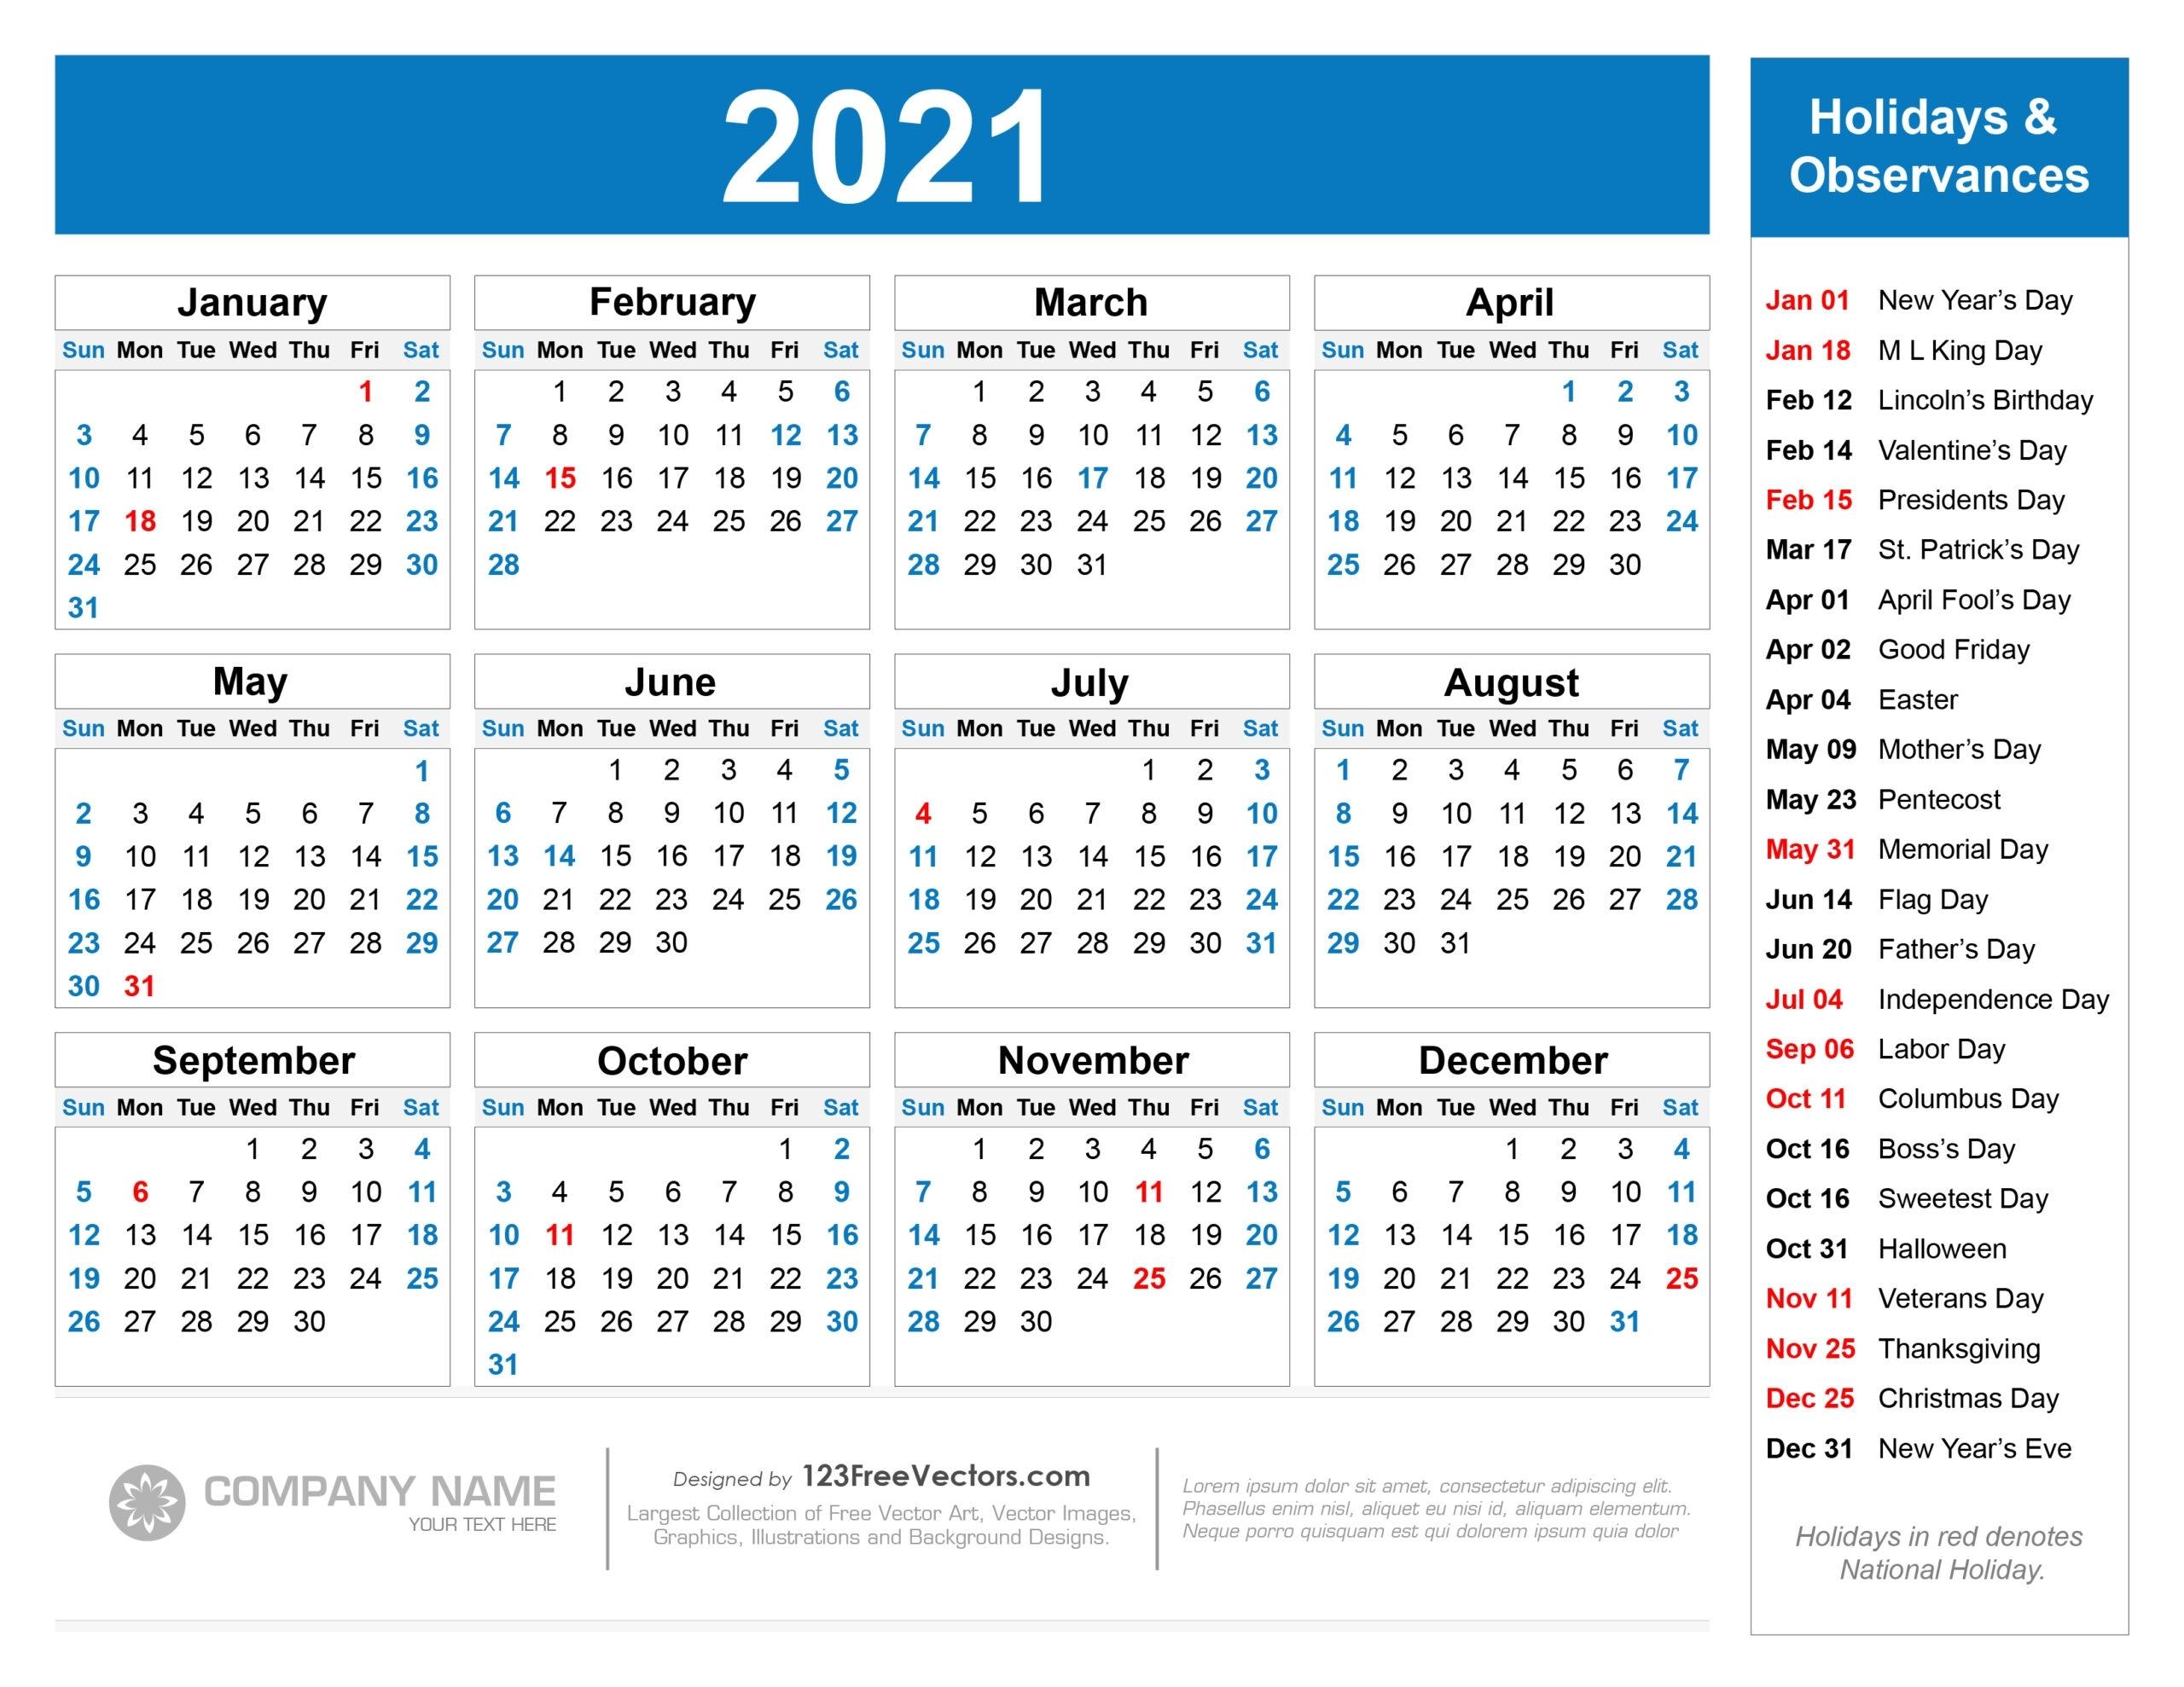 2021 Calendar Holidays And Observances | Printable